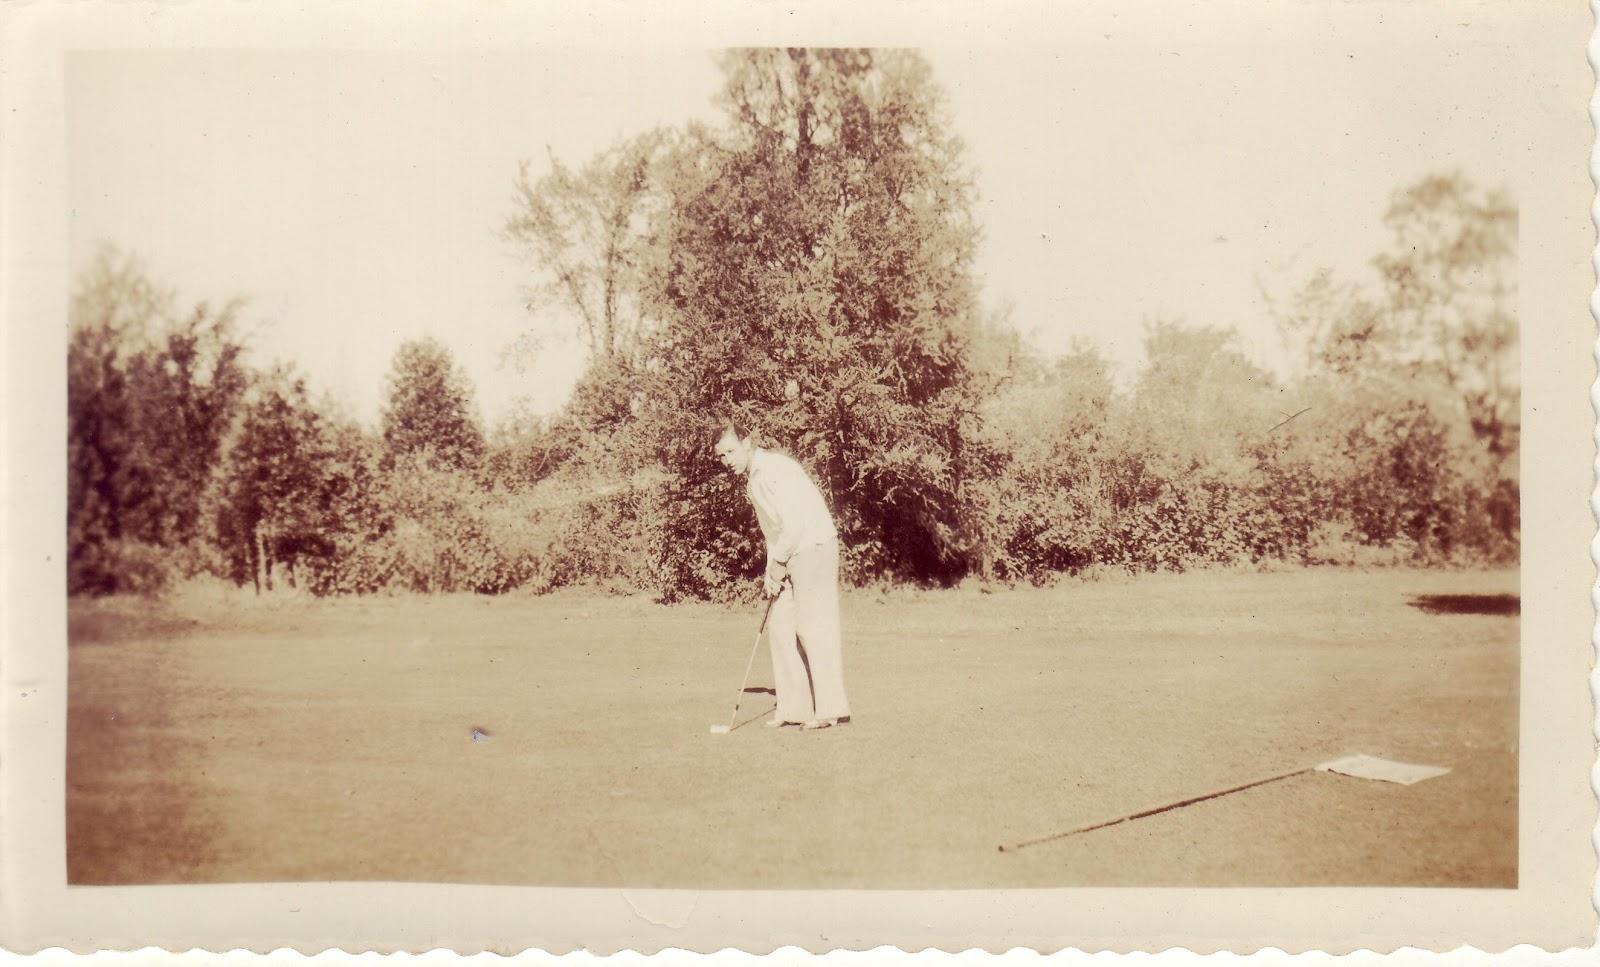 Macintosh HD:Users:BCGC:Downloads:golf course.JPG